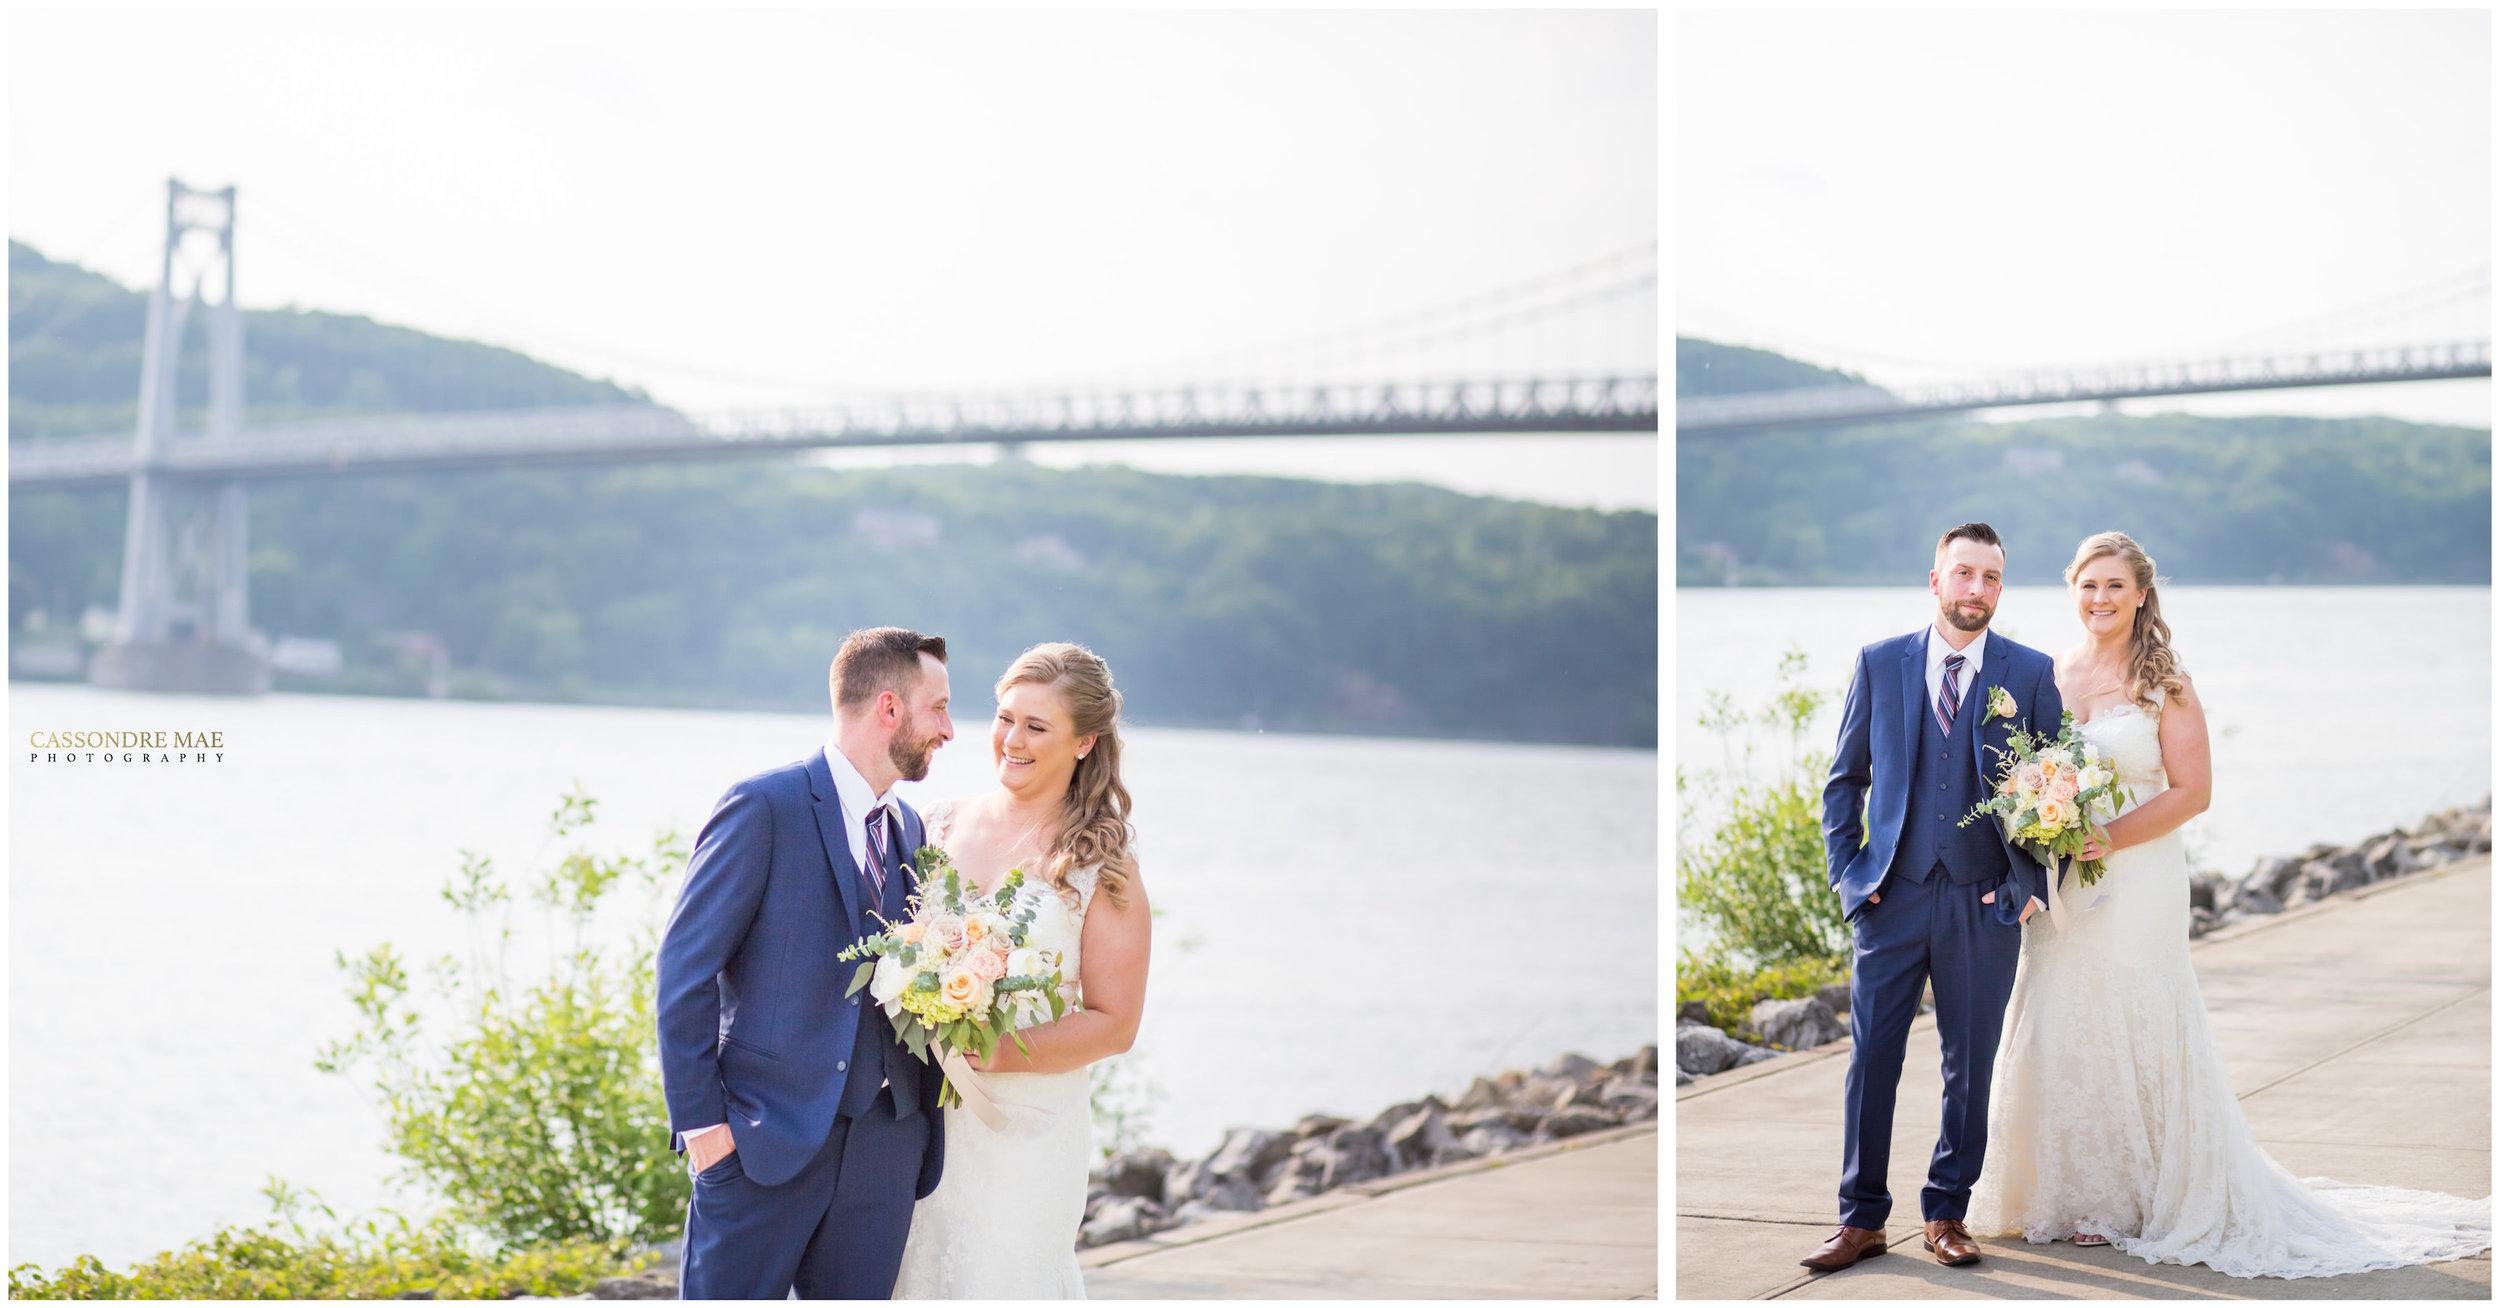 Cassondre Mae Photography Grandview Wedding Photos Poughkeepsie NY Hudson Valley 21.jpg